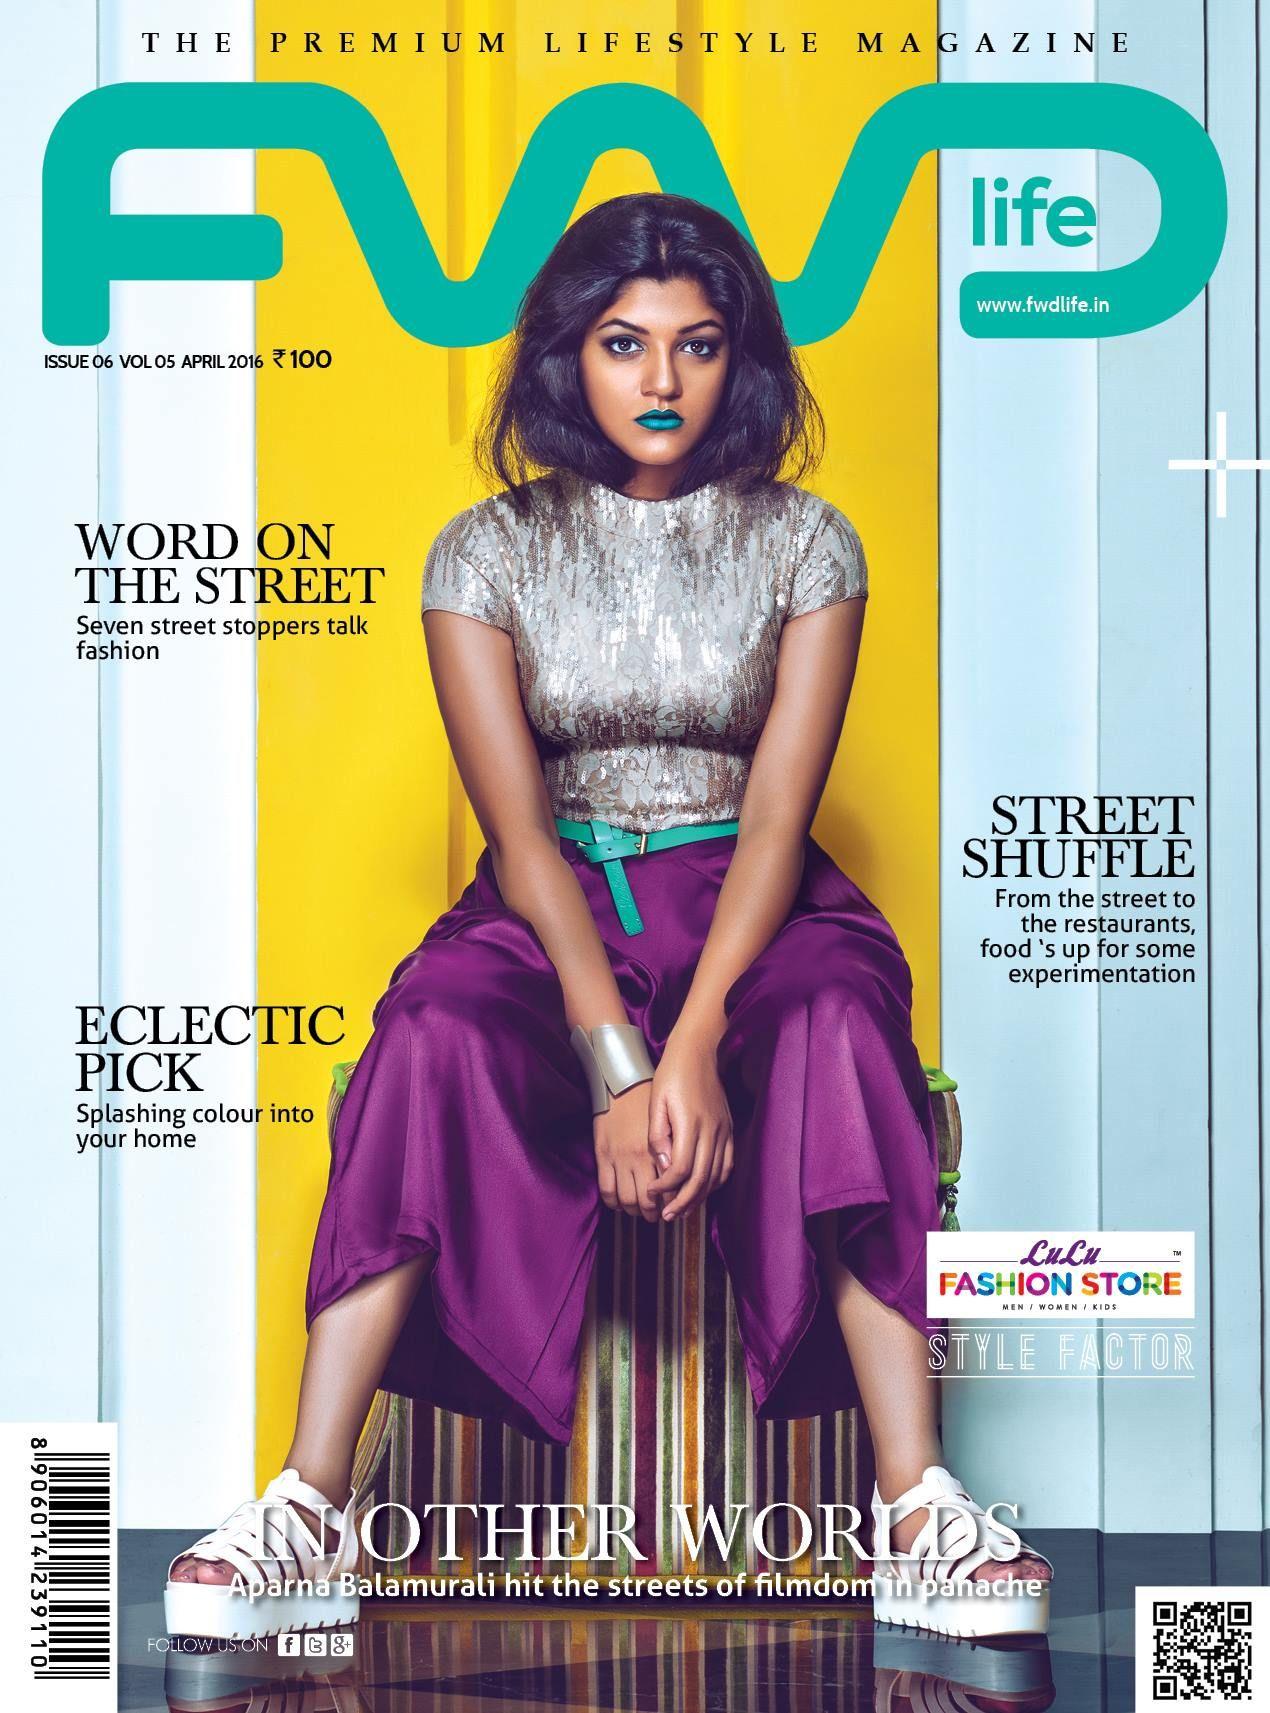 Fwd Life Magazine April 2016 Issue Cover Model Aparna Balamurali Photographed By Jinson Abraham Photography S Lulu Fashion Store Lifestyle Lifestyle Magazine